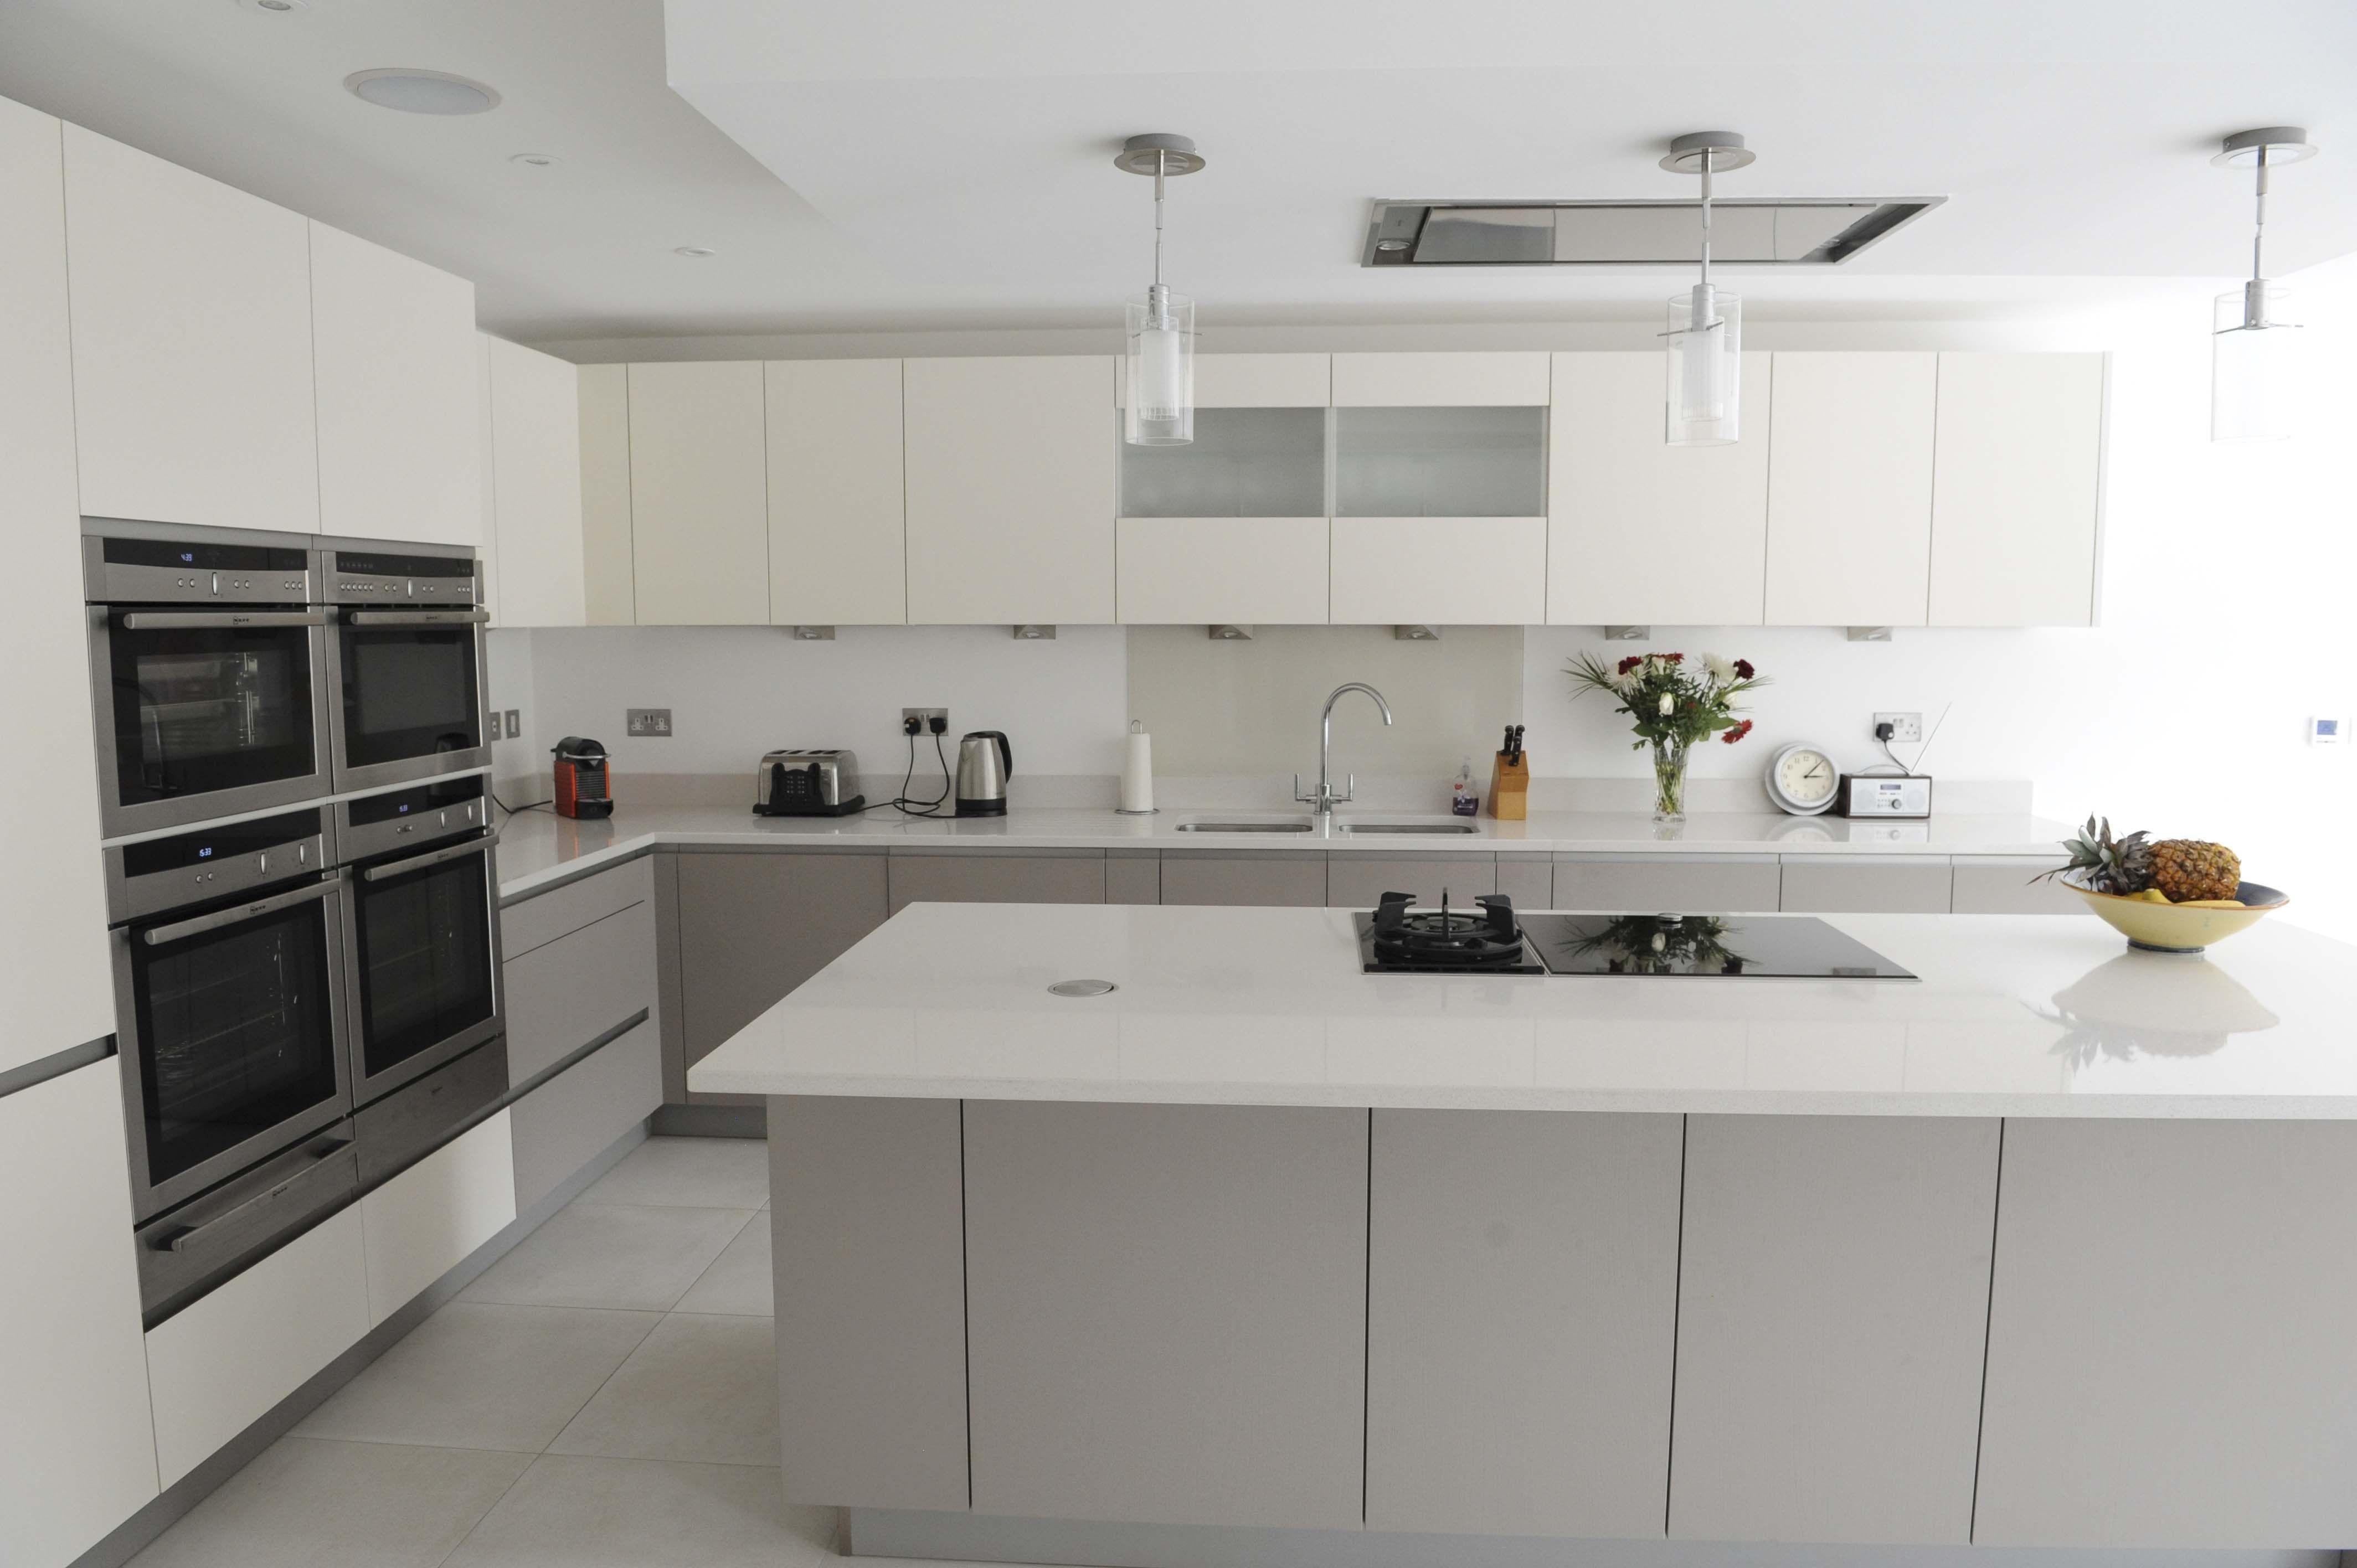 Calm Kitchen for a Busy Family   Quartzs, Families and Lava   {Nolte küchen magnolia matt 84}